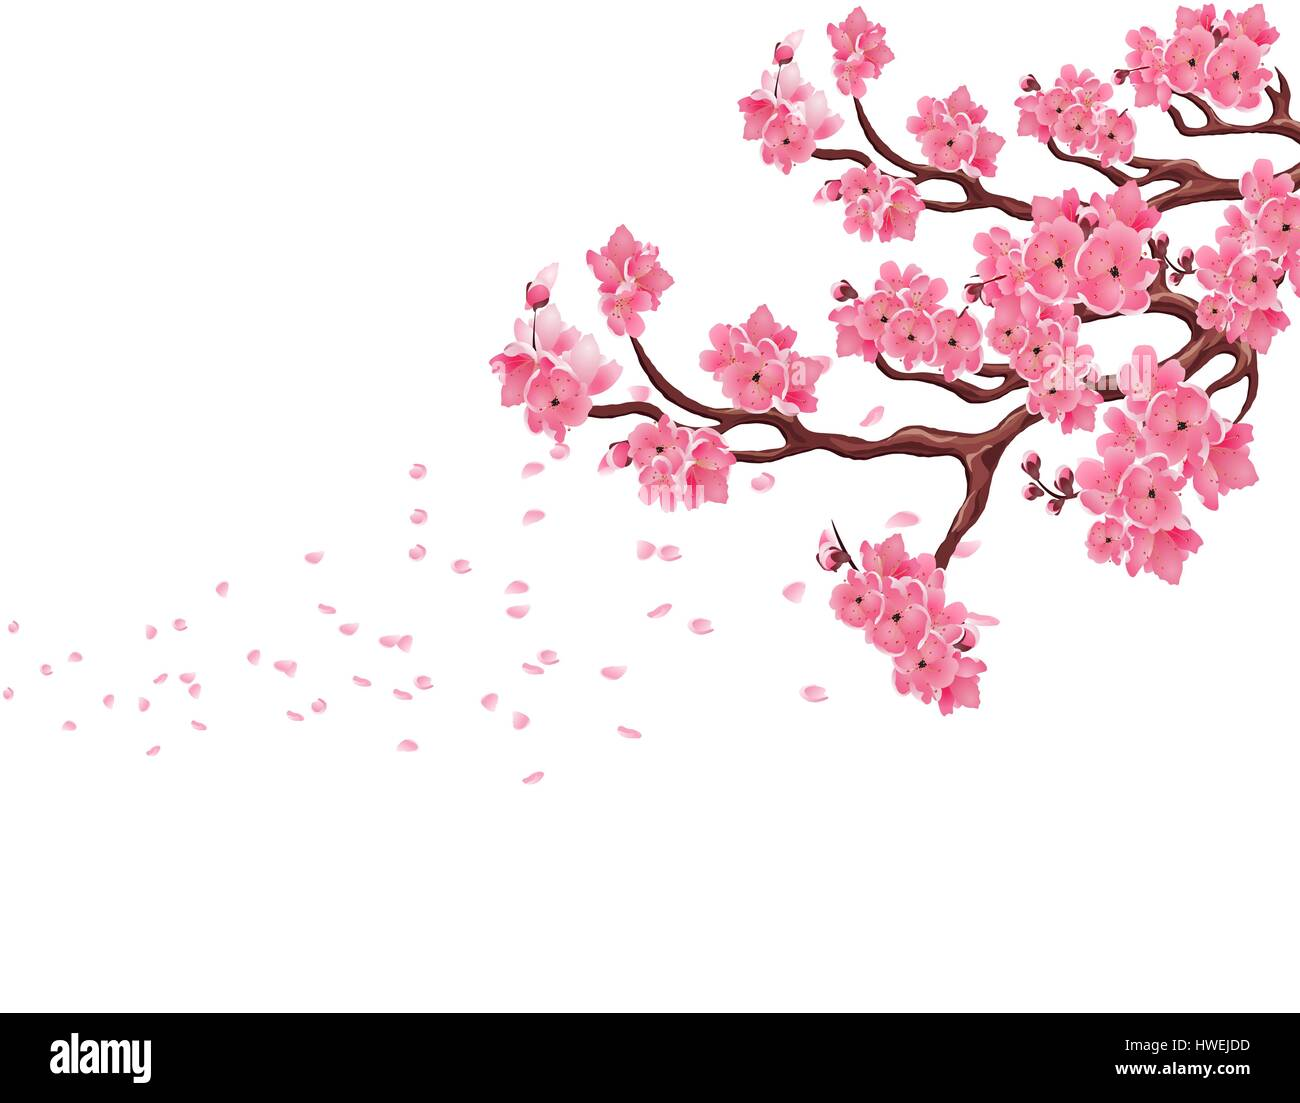 Decorative Peach Tree